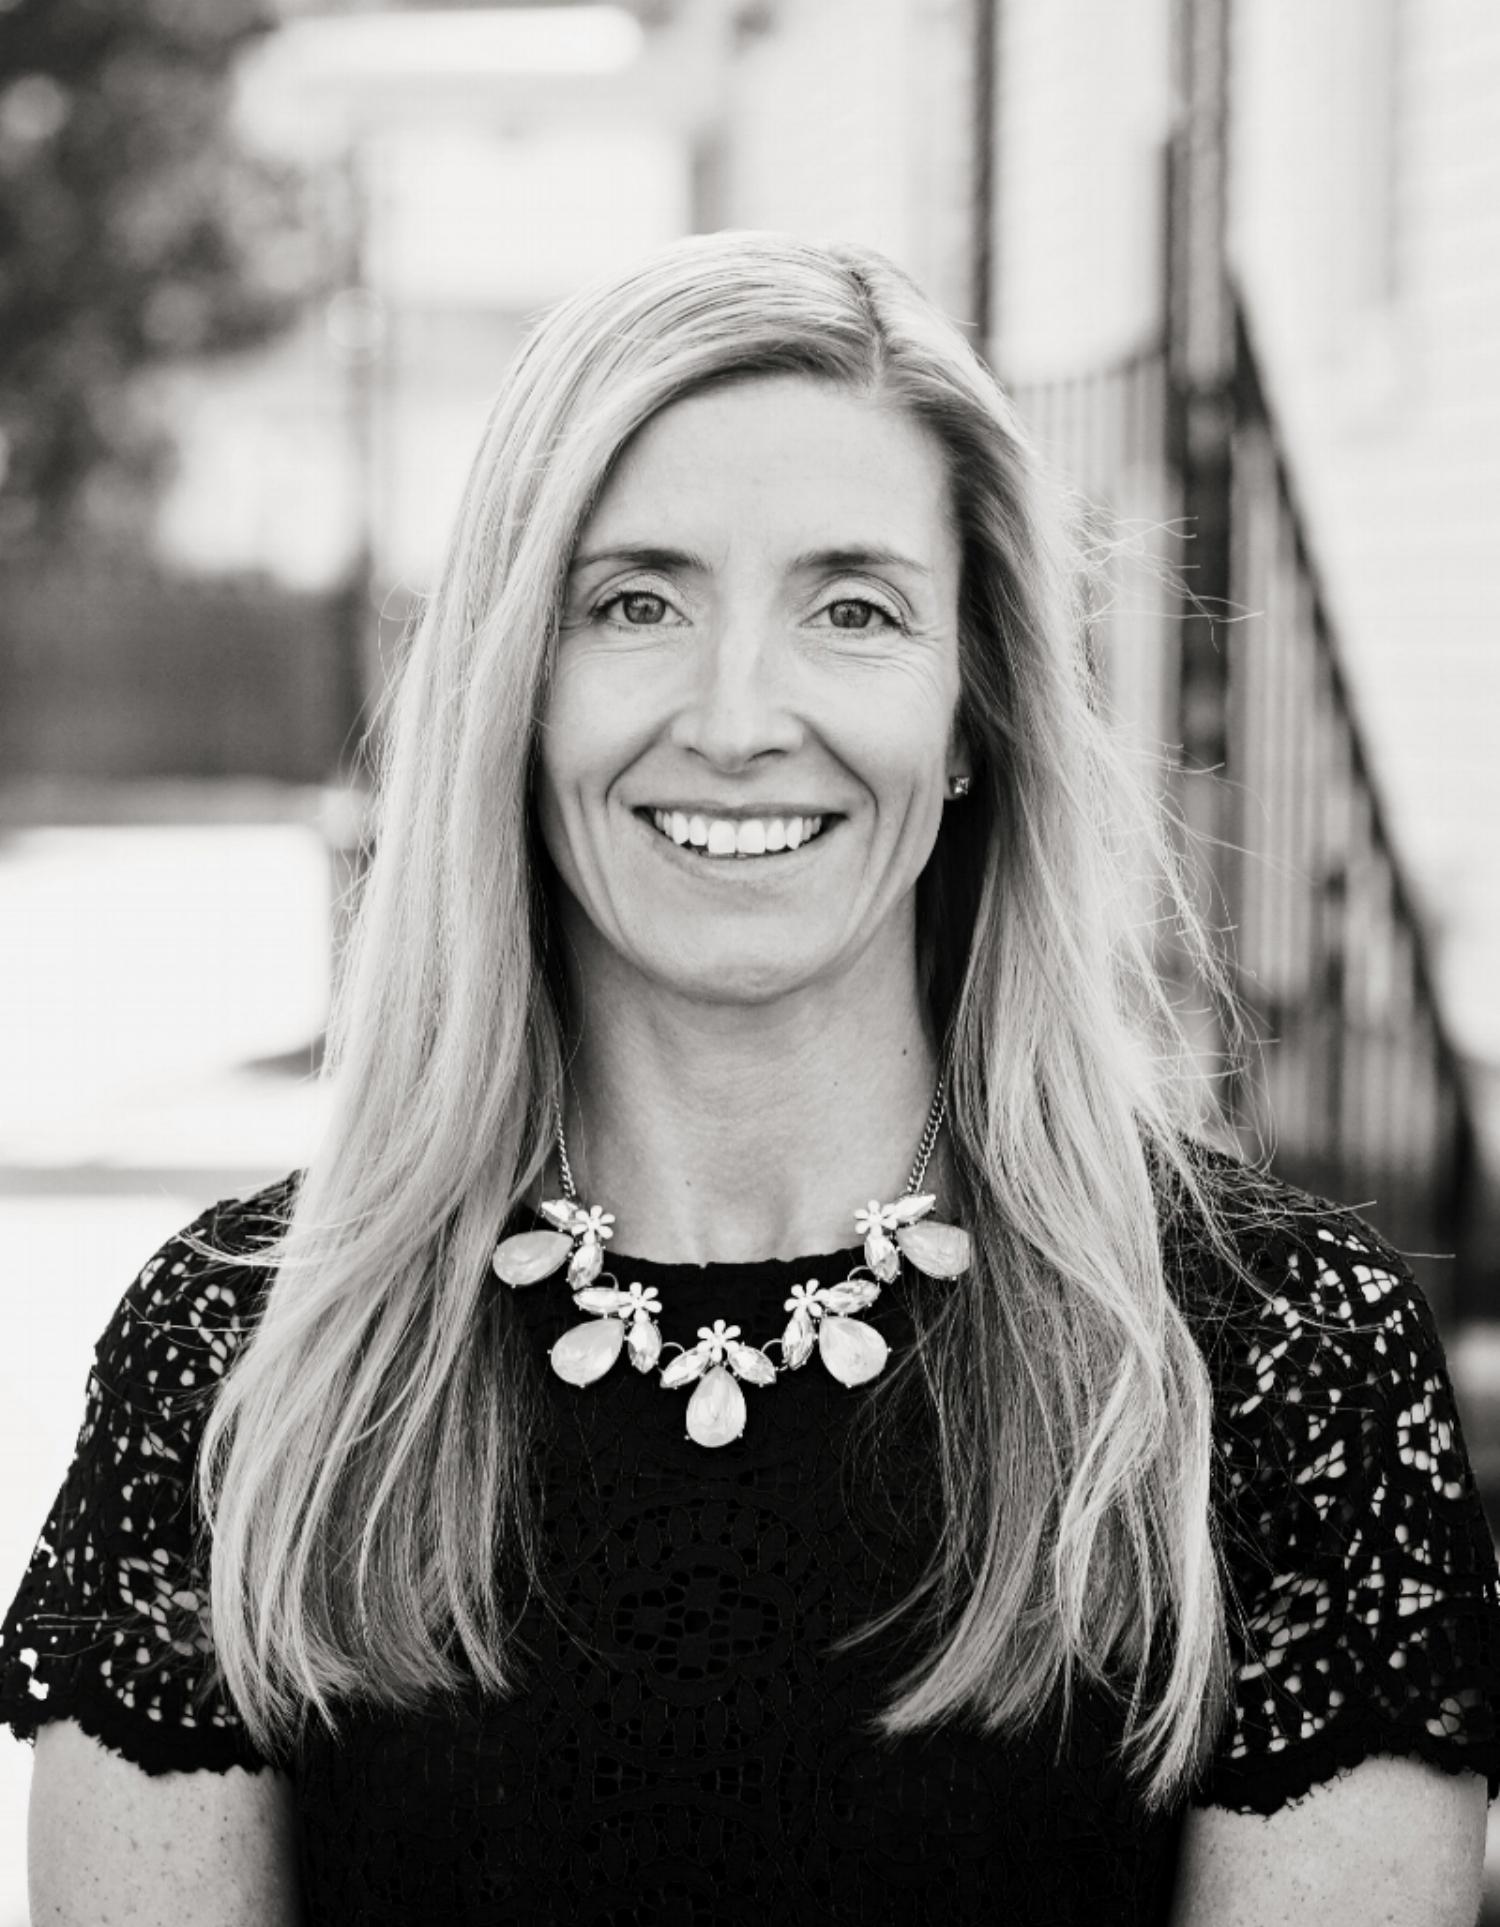 Alicia Erickson Zink, MSW, LCSW - Managing Partner